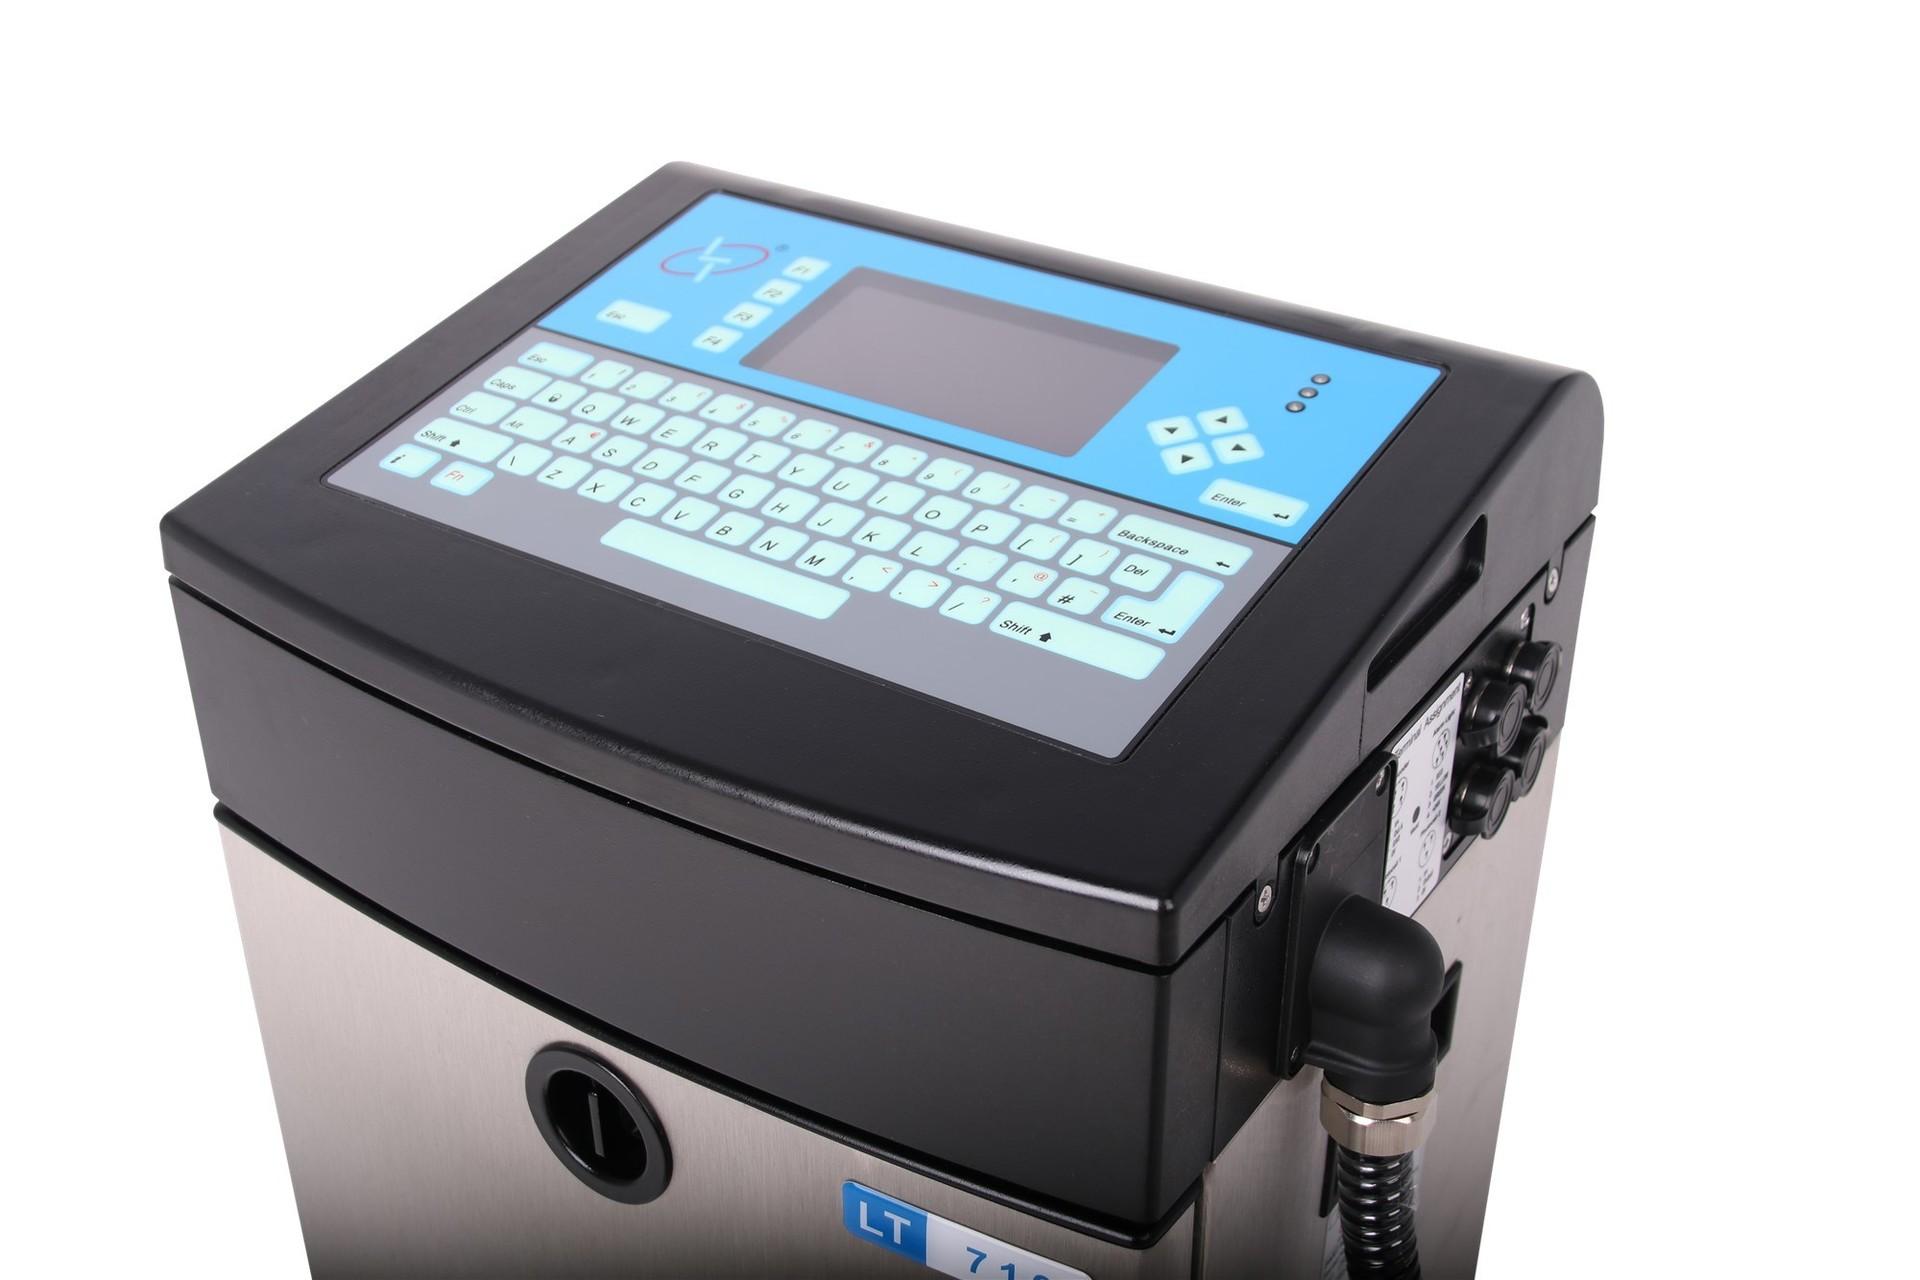 Lead Tech Lt710 Reverse Printing Continuous Cij Inkjet Printer